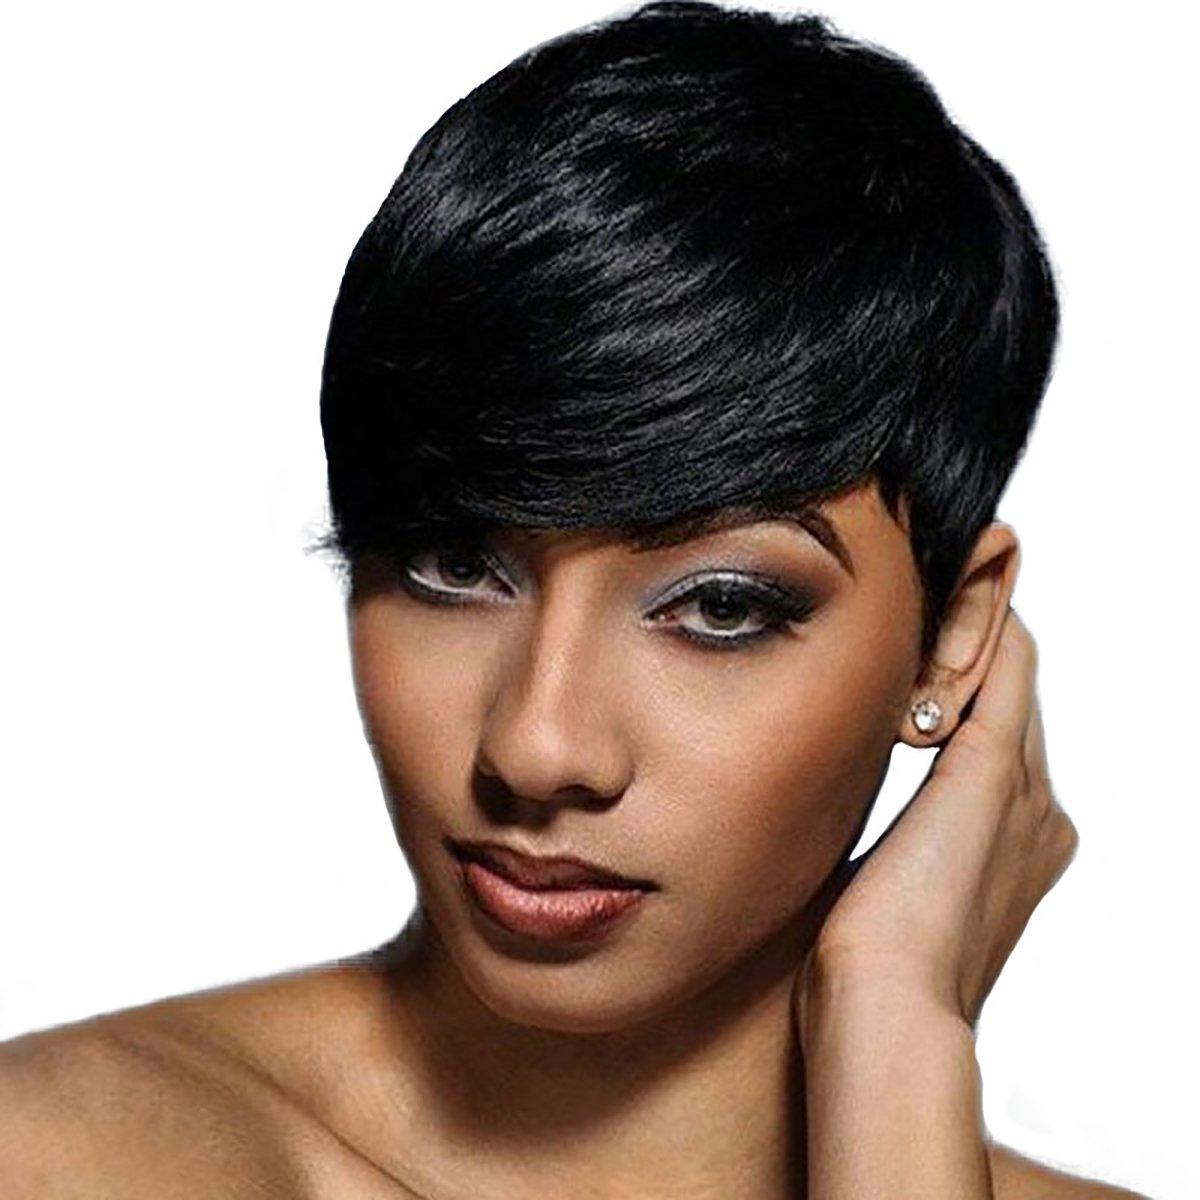 amazoncom short black pixie cut hair natural synthetic